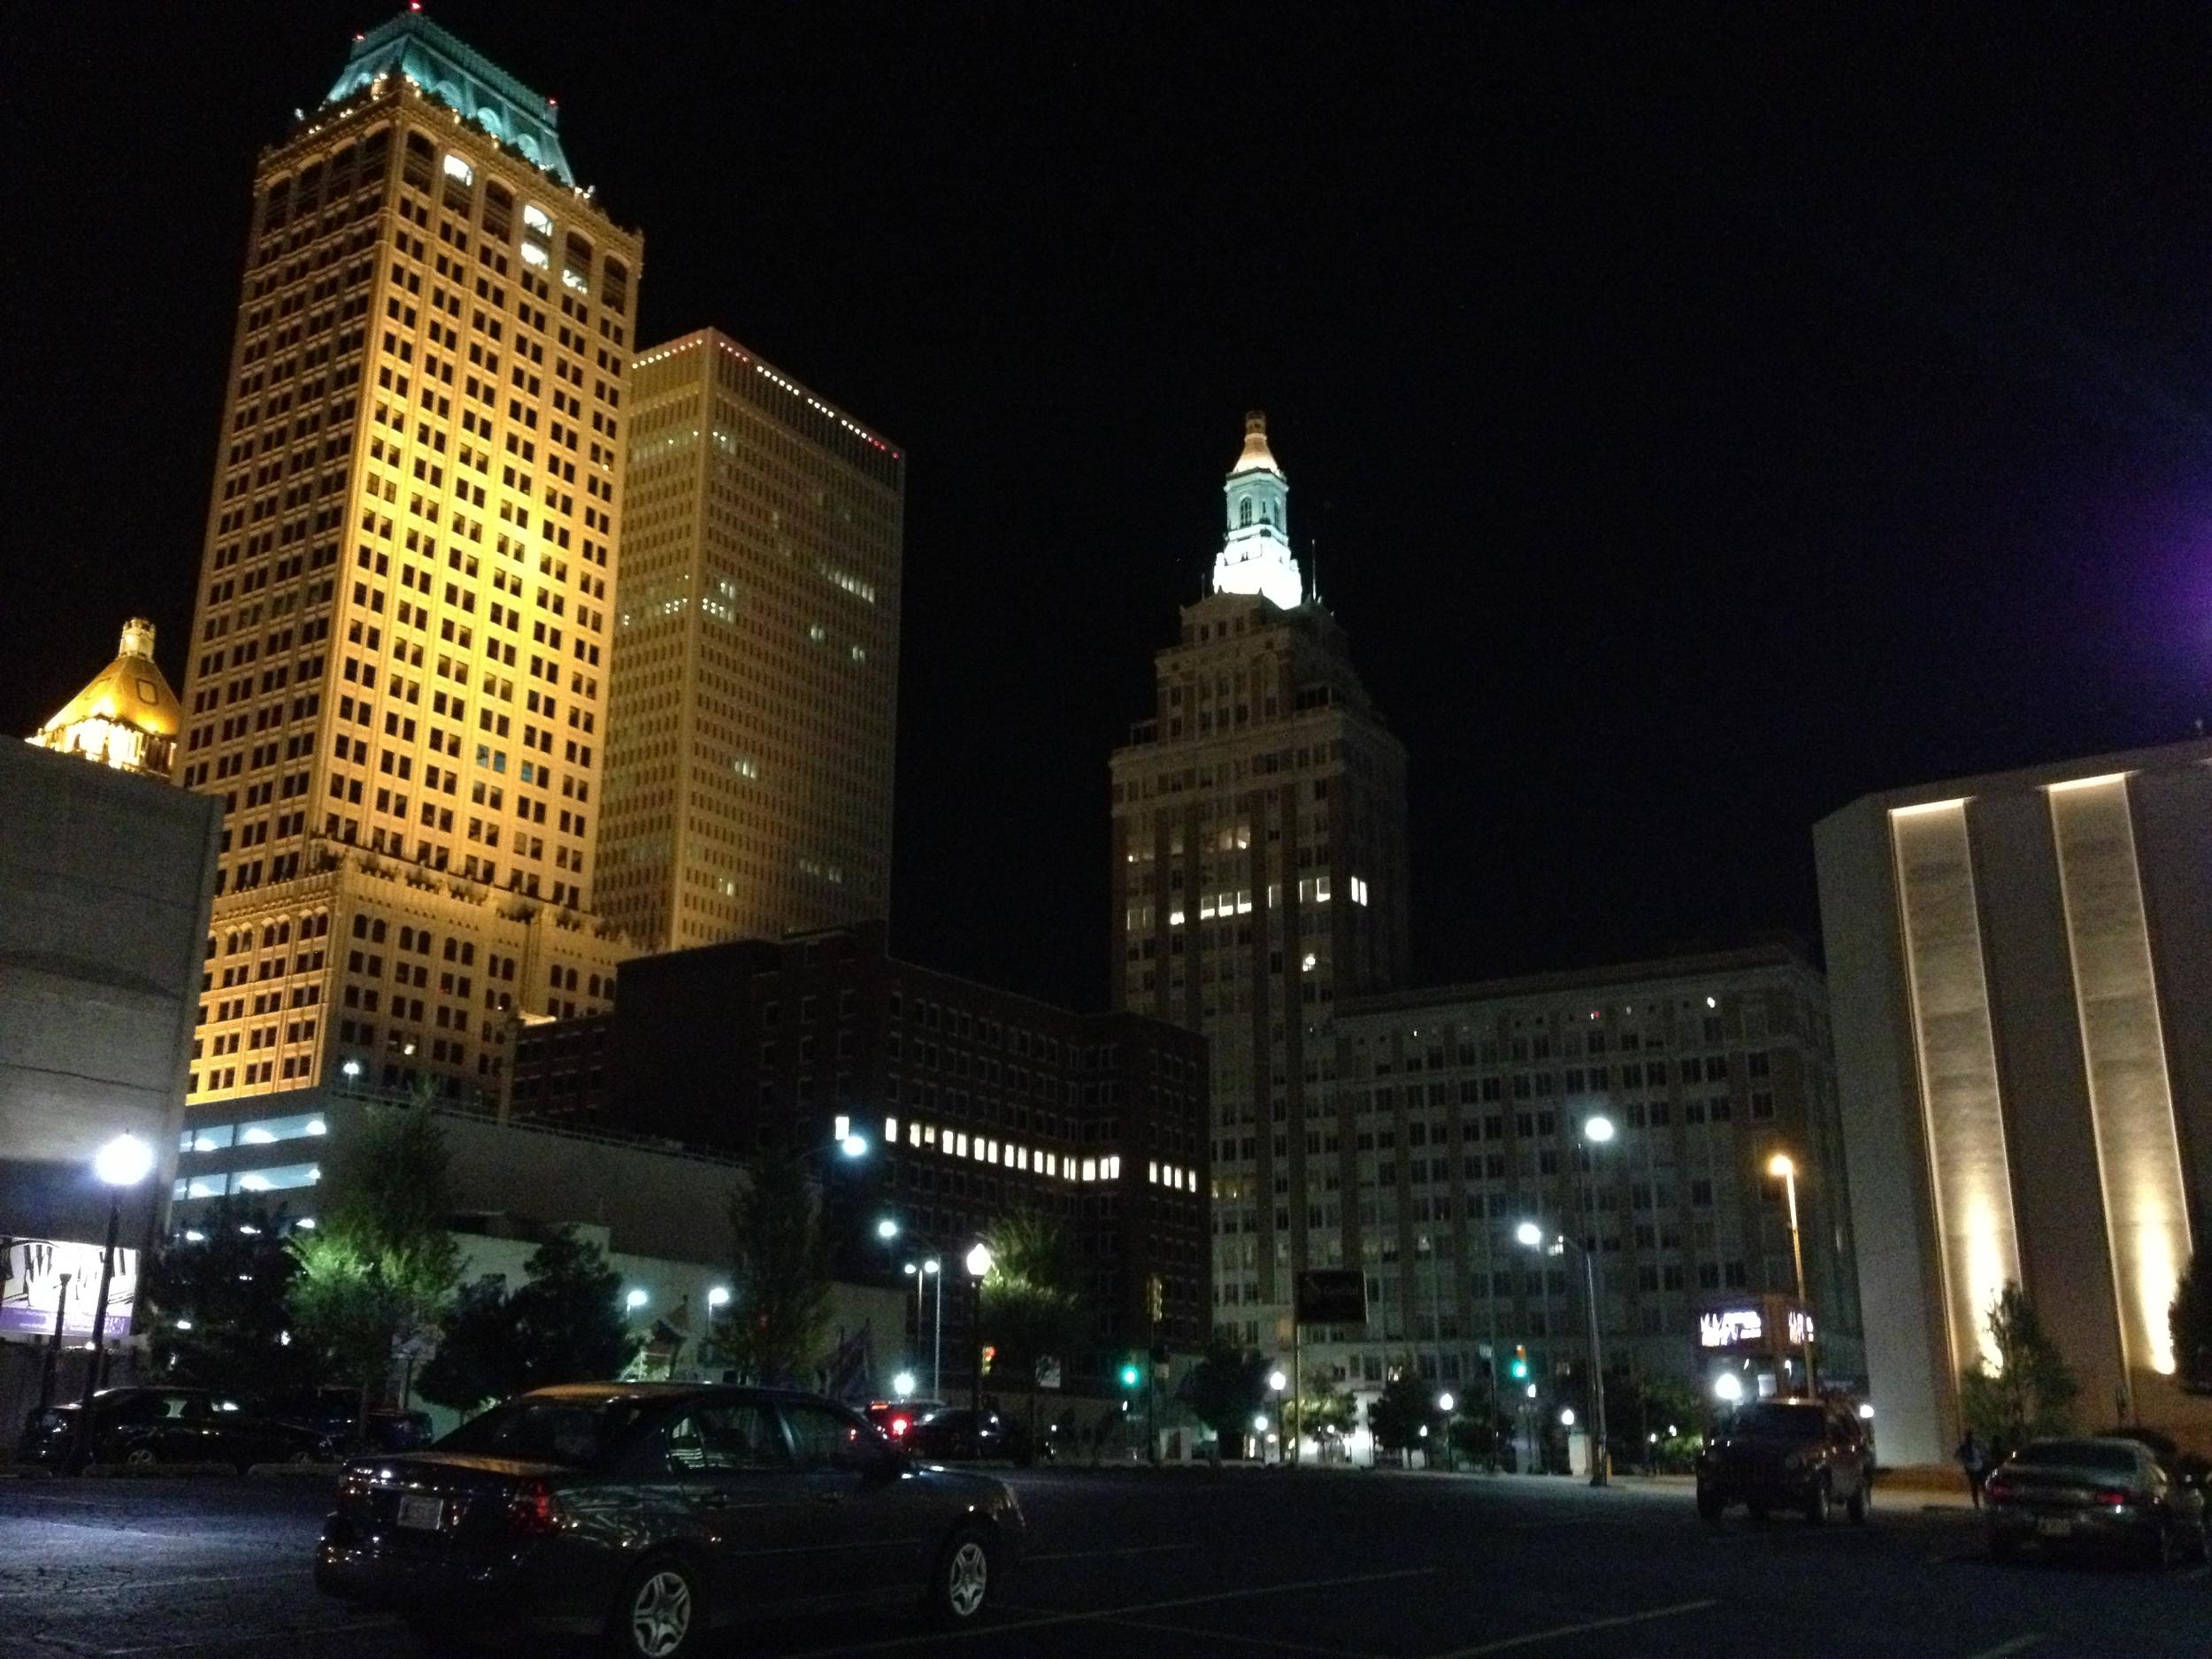 Street view of Tulsa Bulidings